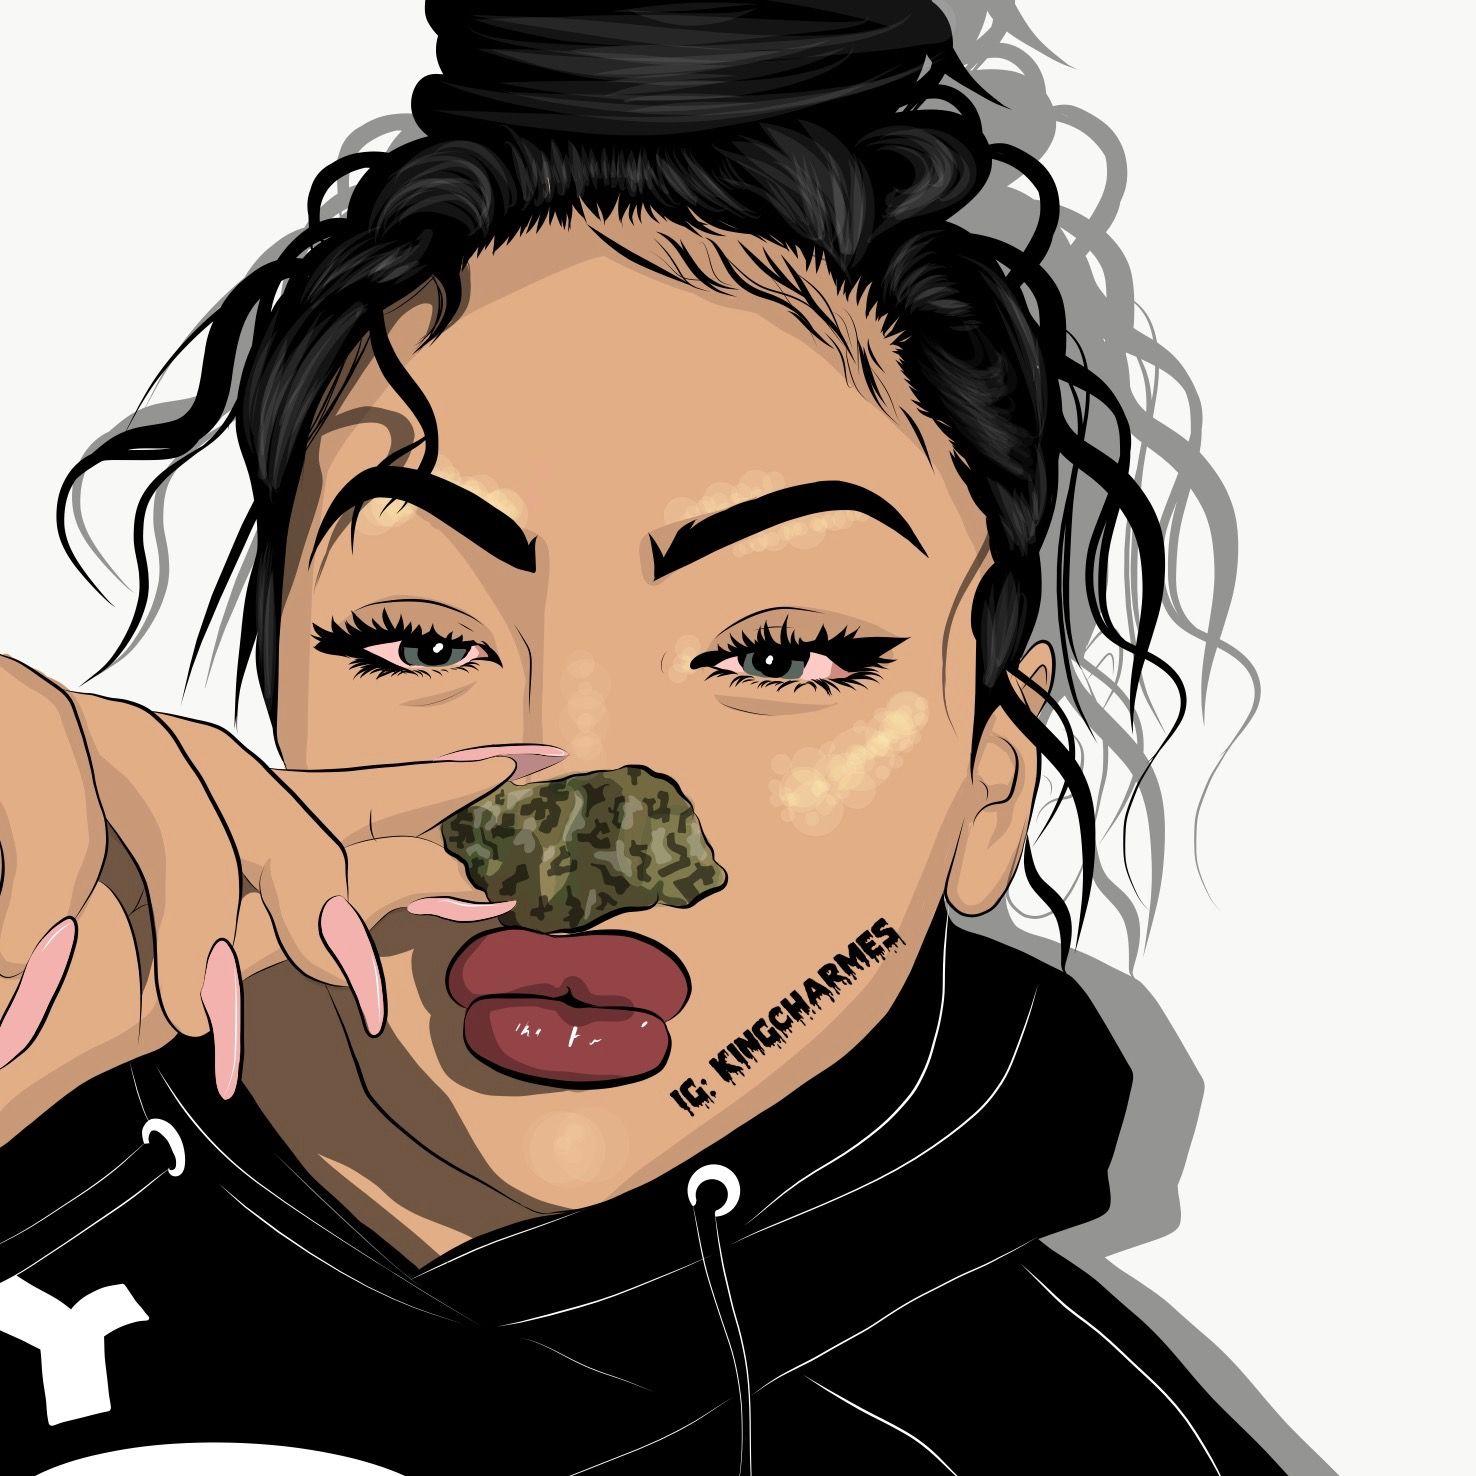 Gangsta girl drawings tumblr